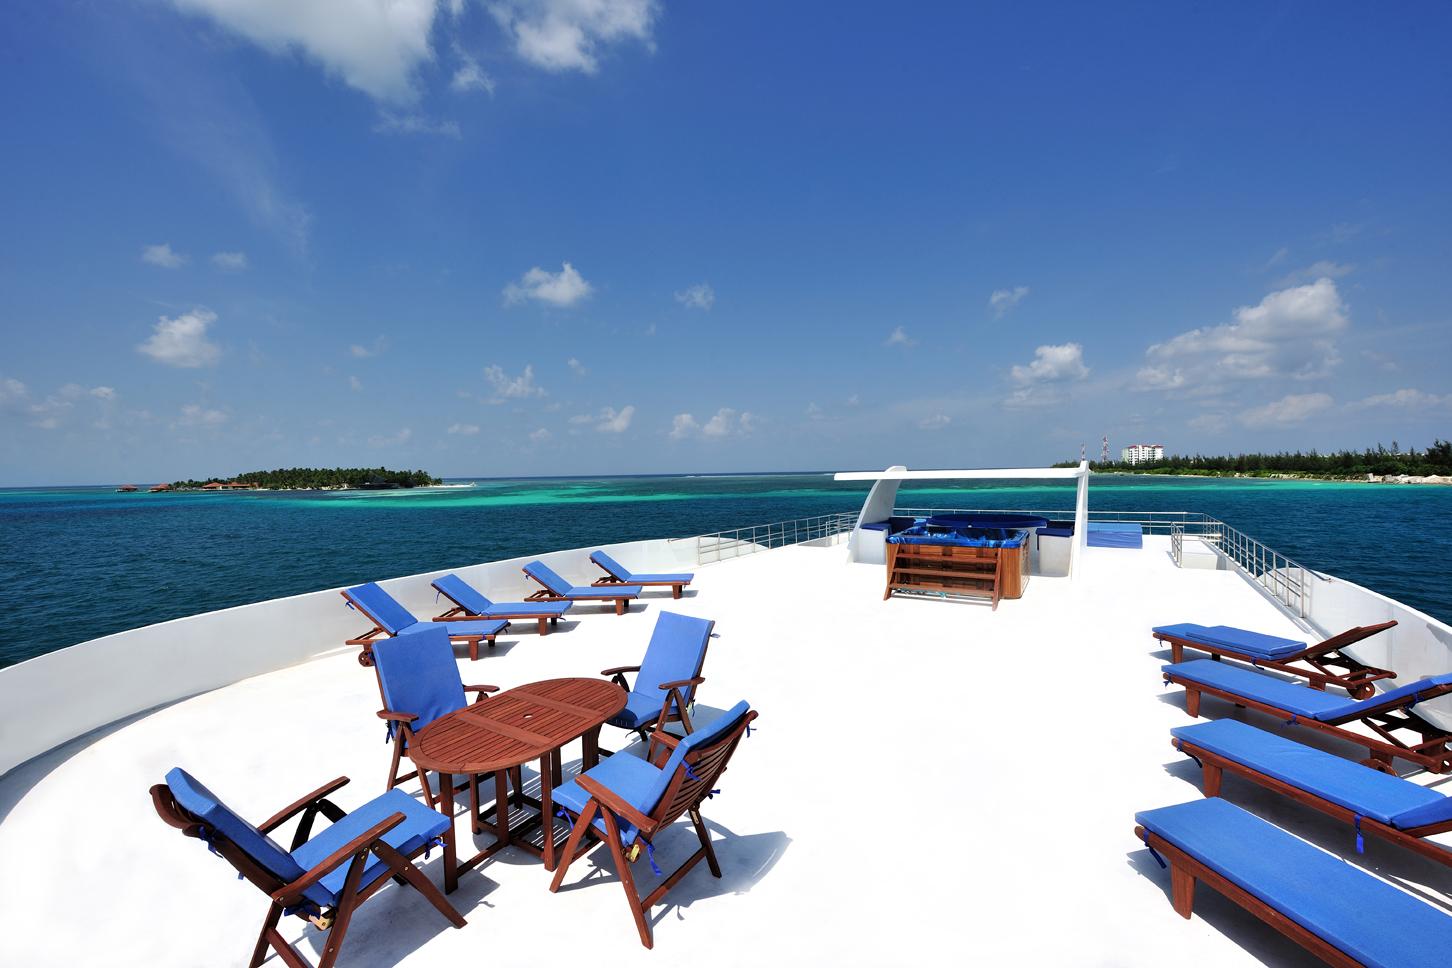 дайвинг сафари яхта Mozaique солнечная палуба